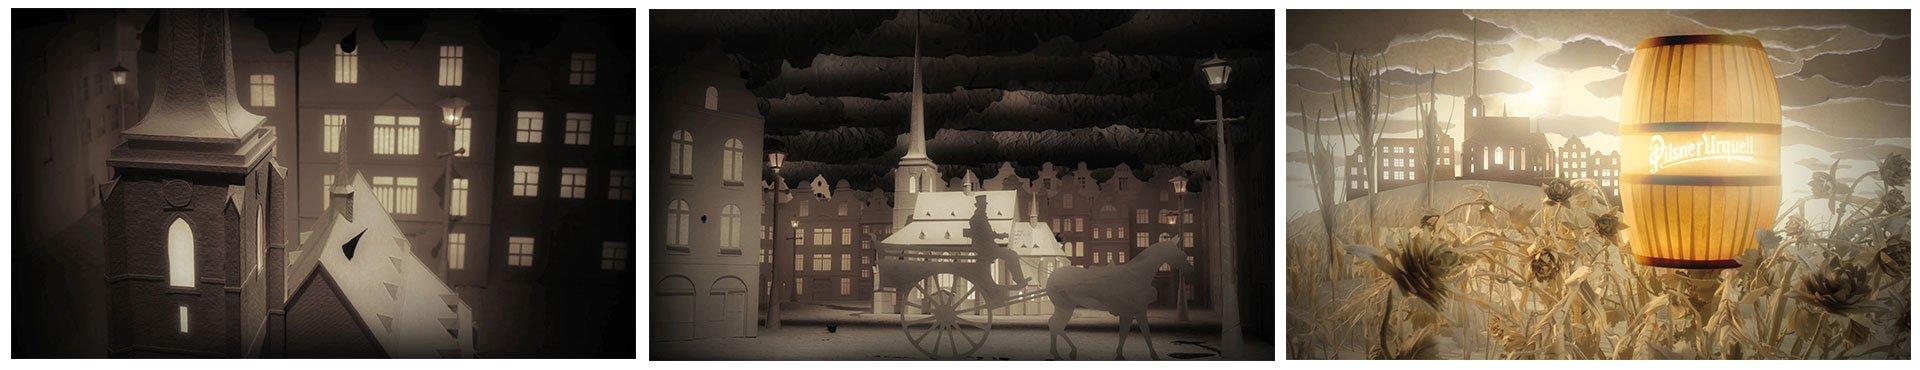 Three stills from the Pilsner Urquell stop motion animation